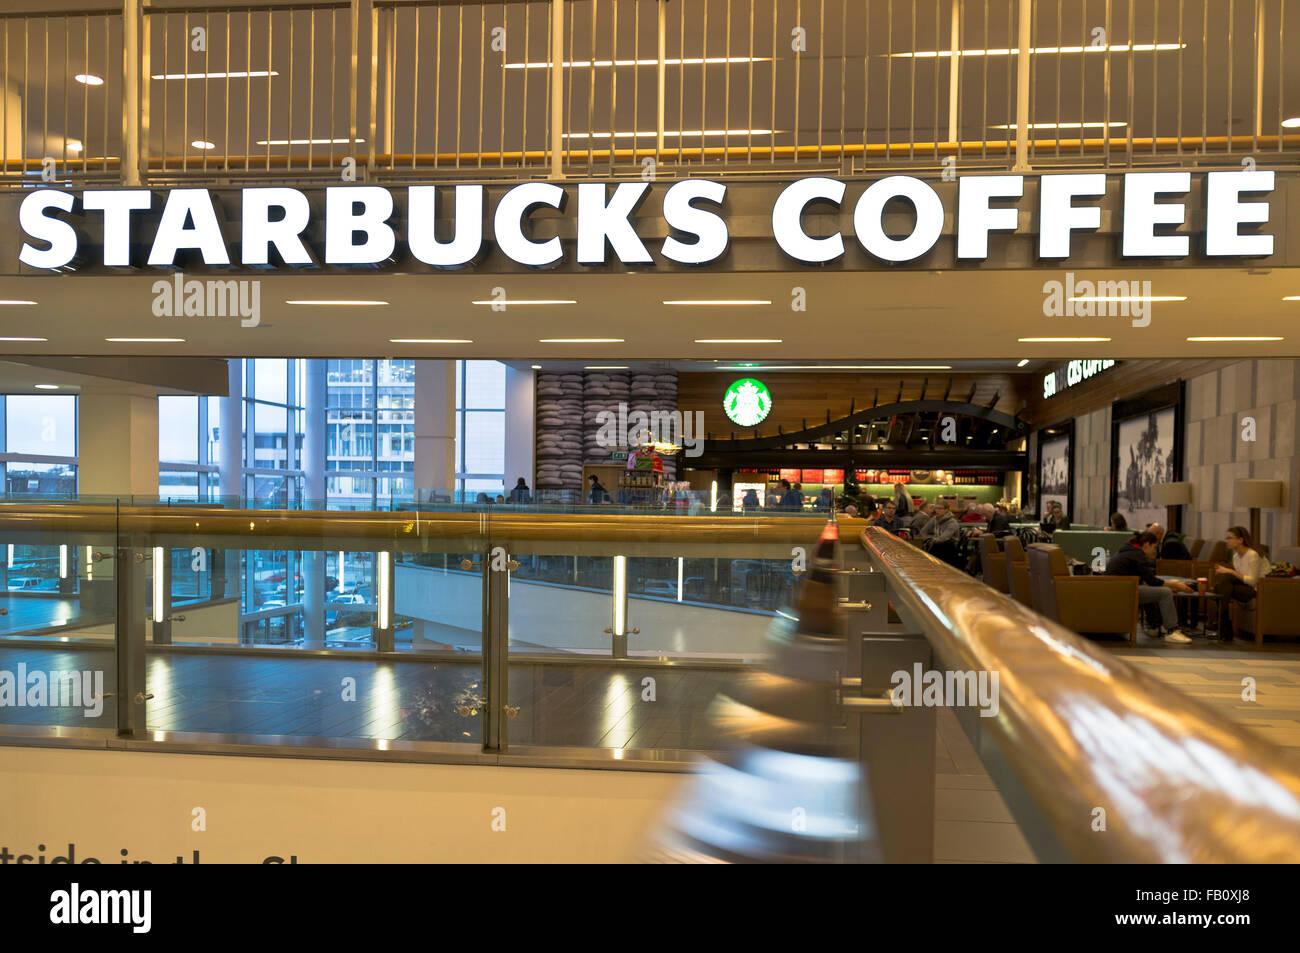 Dh Starbucks Cafe Coffee Shop Uk Modern Shopping Centre Mall Stock Photo Alamy